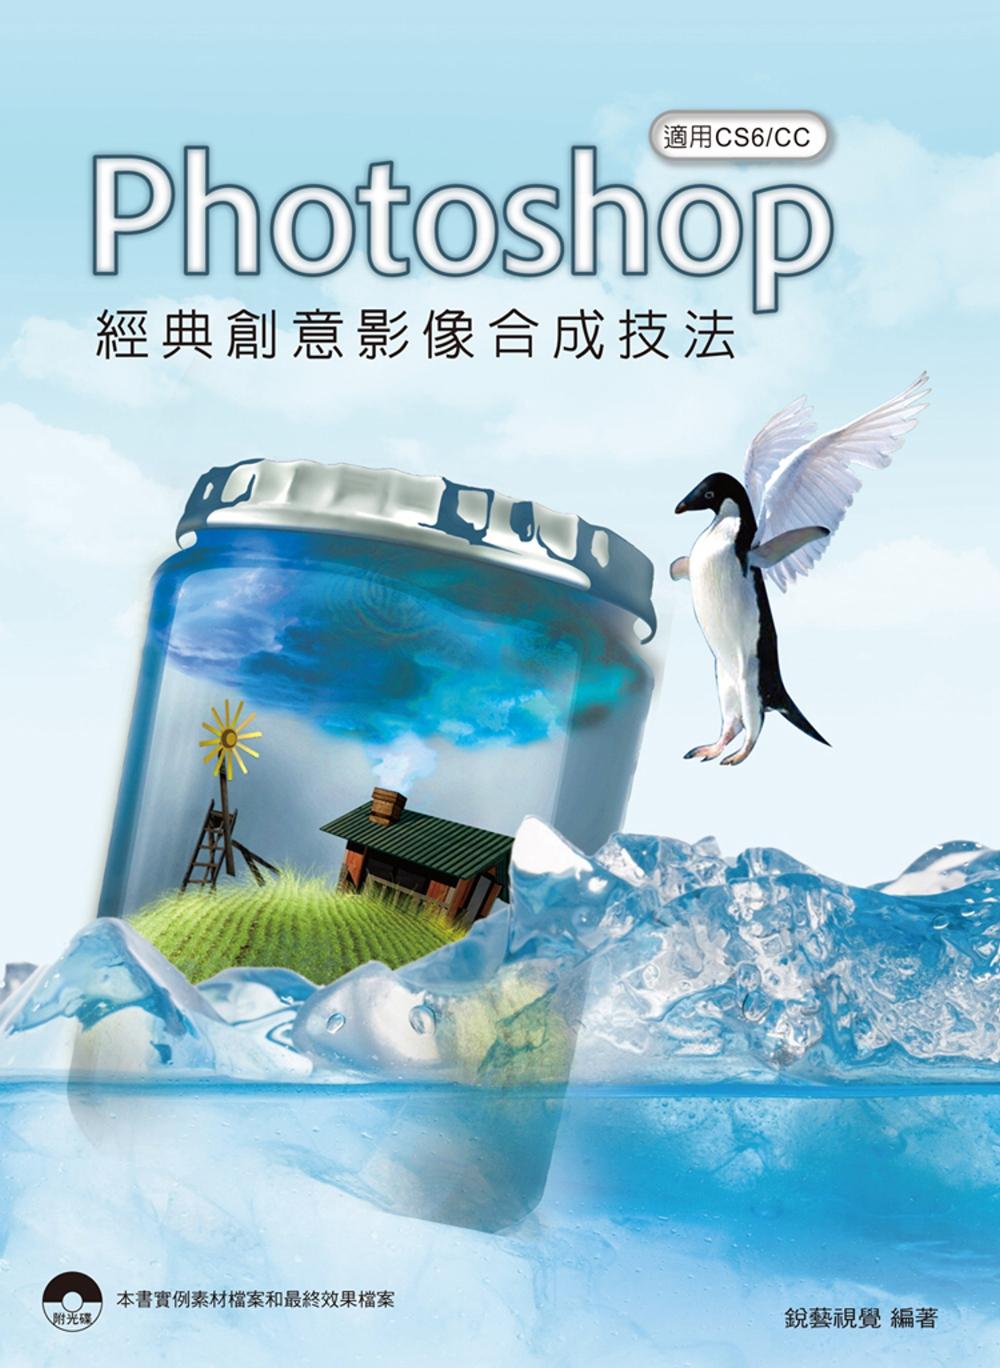 Photoshop 經典創意影像合成技法(適用CS6/CC)